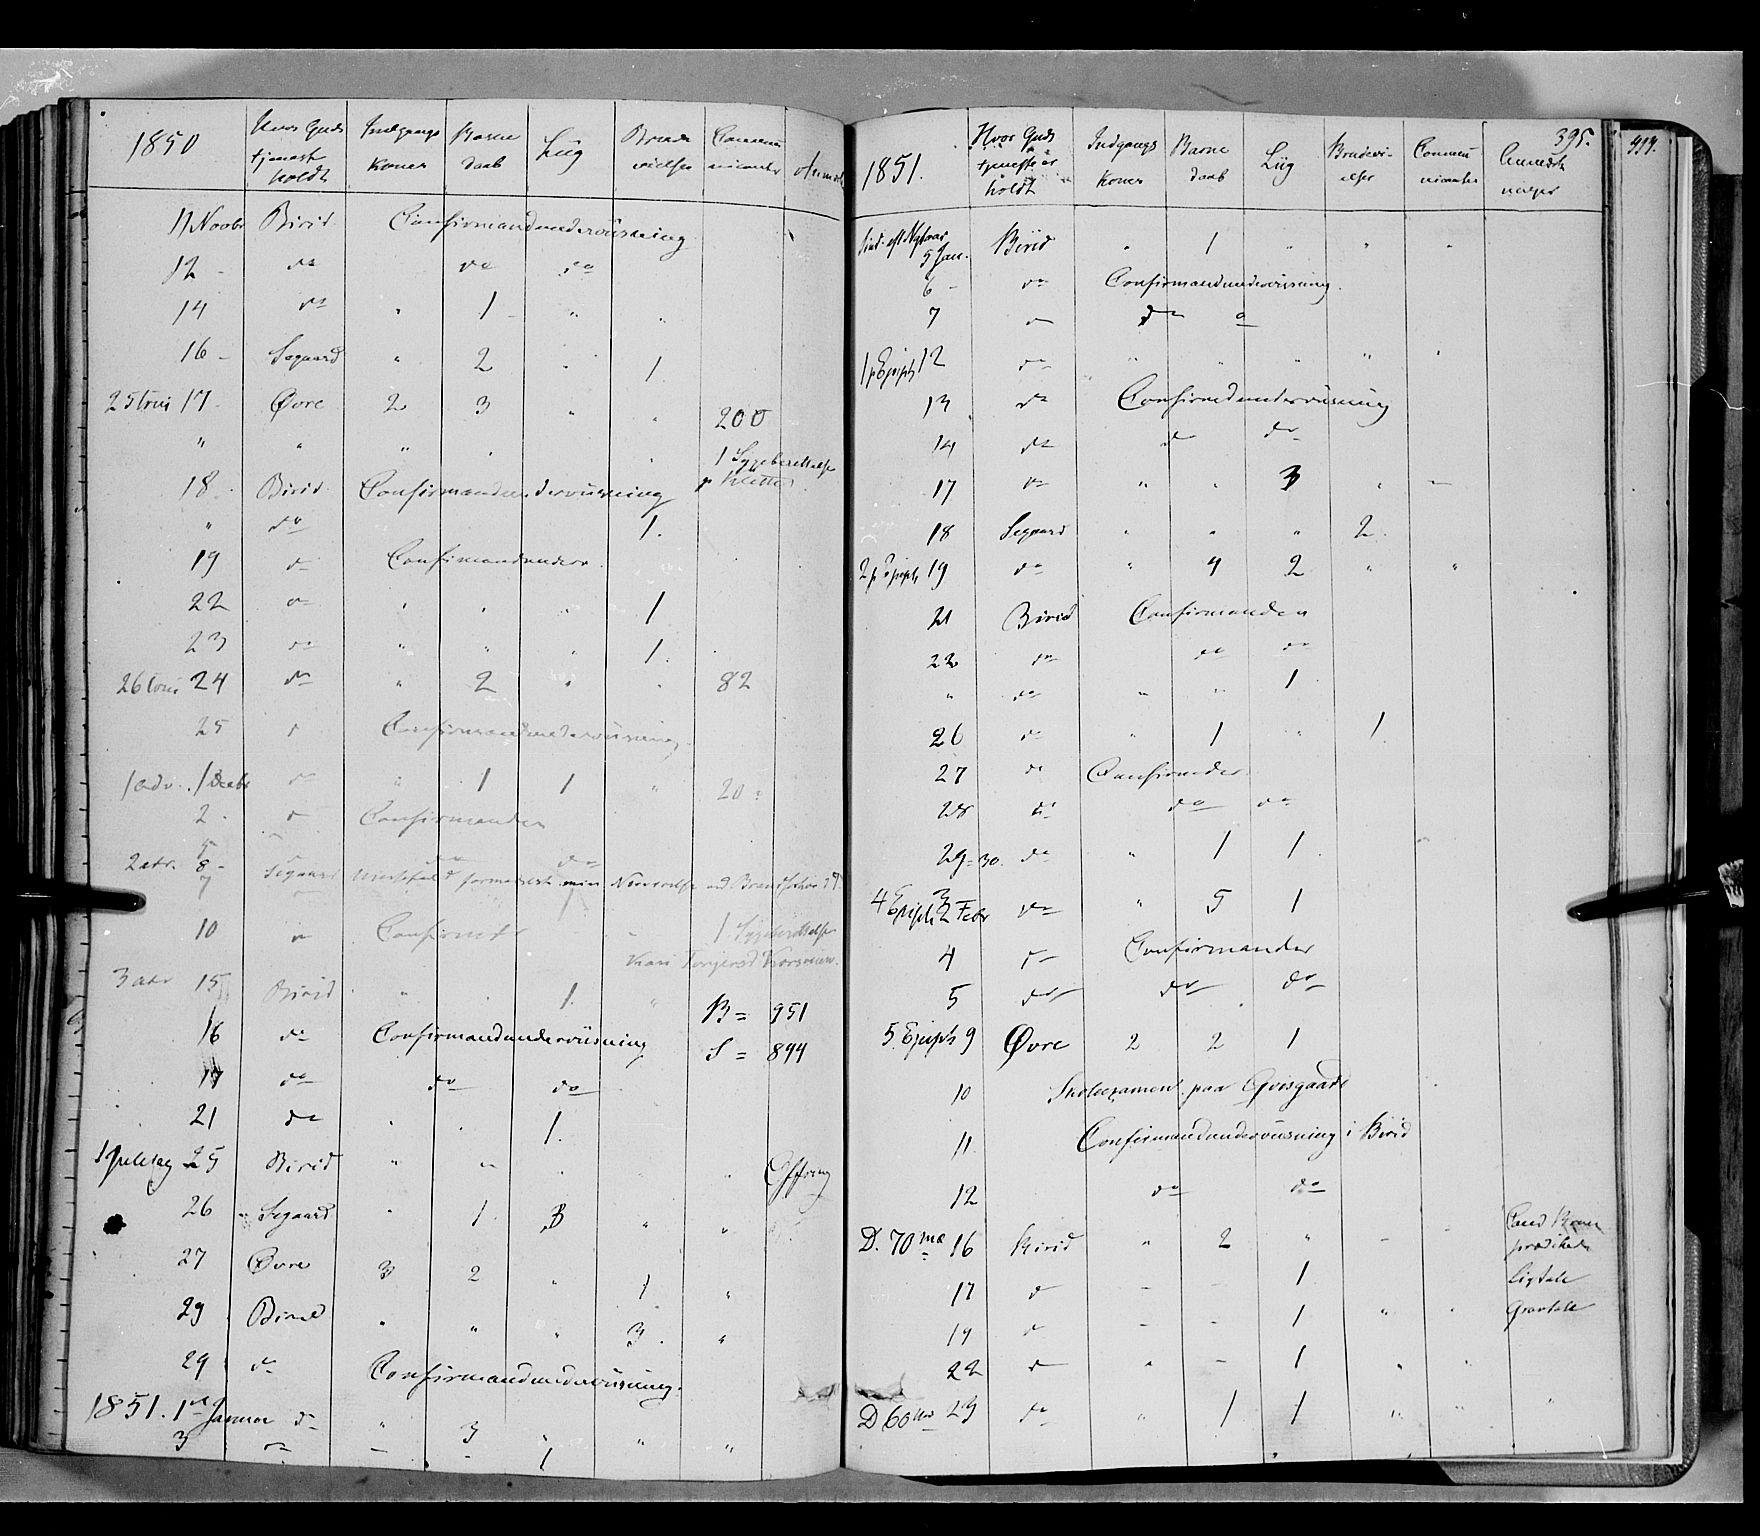 SAH, Biri prestekontor, Ministerialbok nr. 5, 1843-1854, s. 395